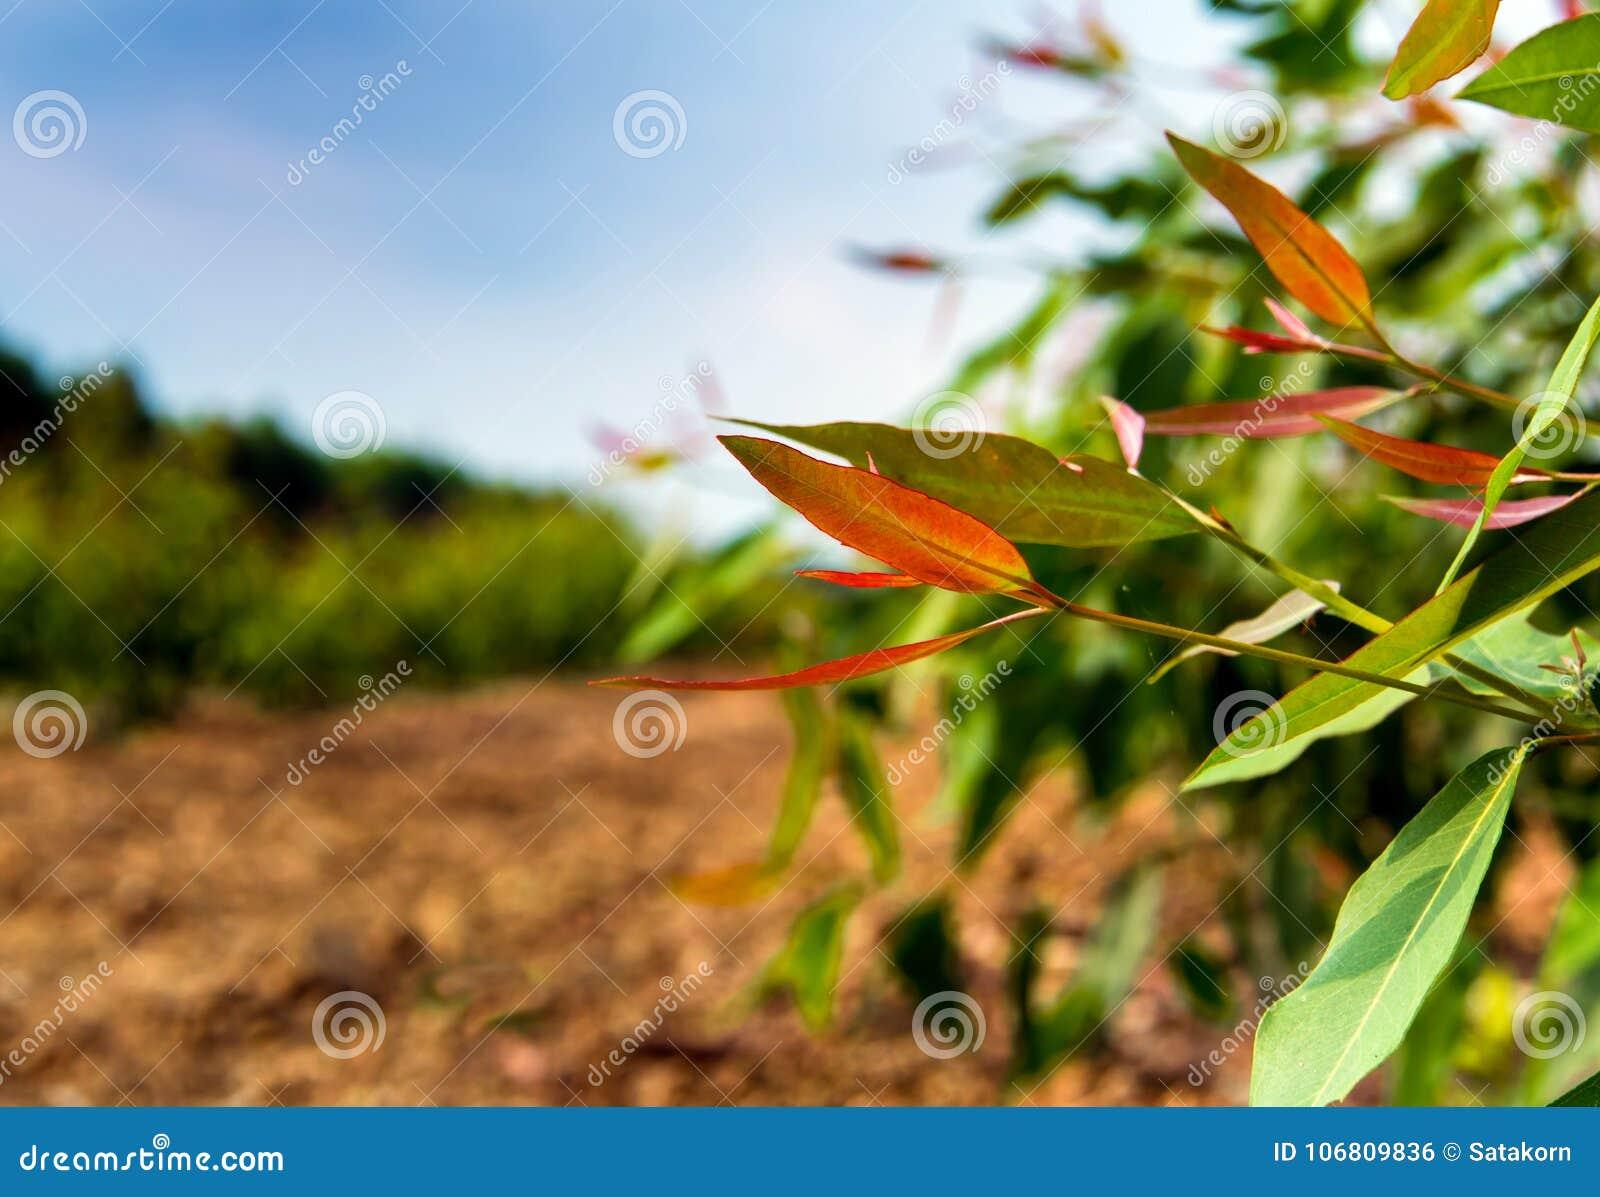 Growth Eucalyptus Tree In The Plantation Stock Photo Image Of